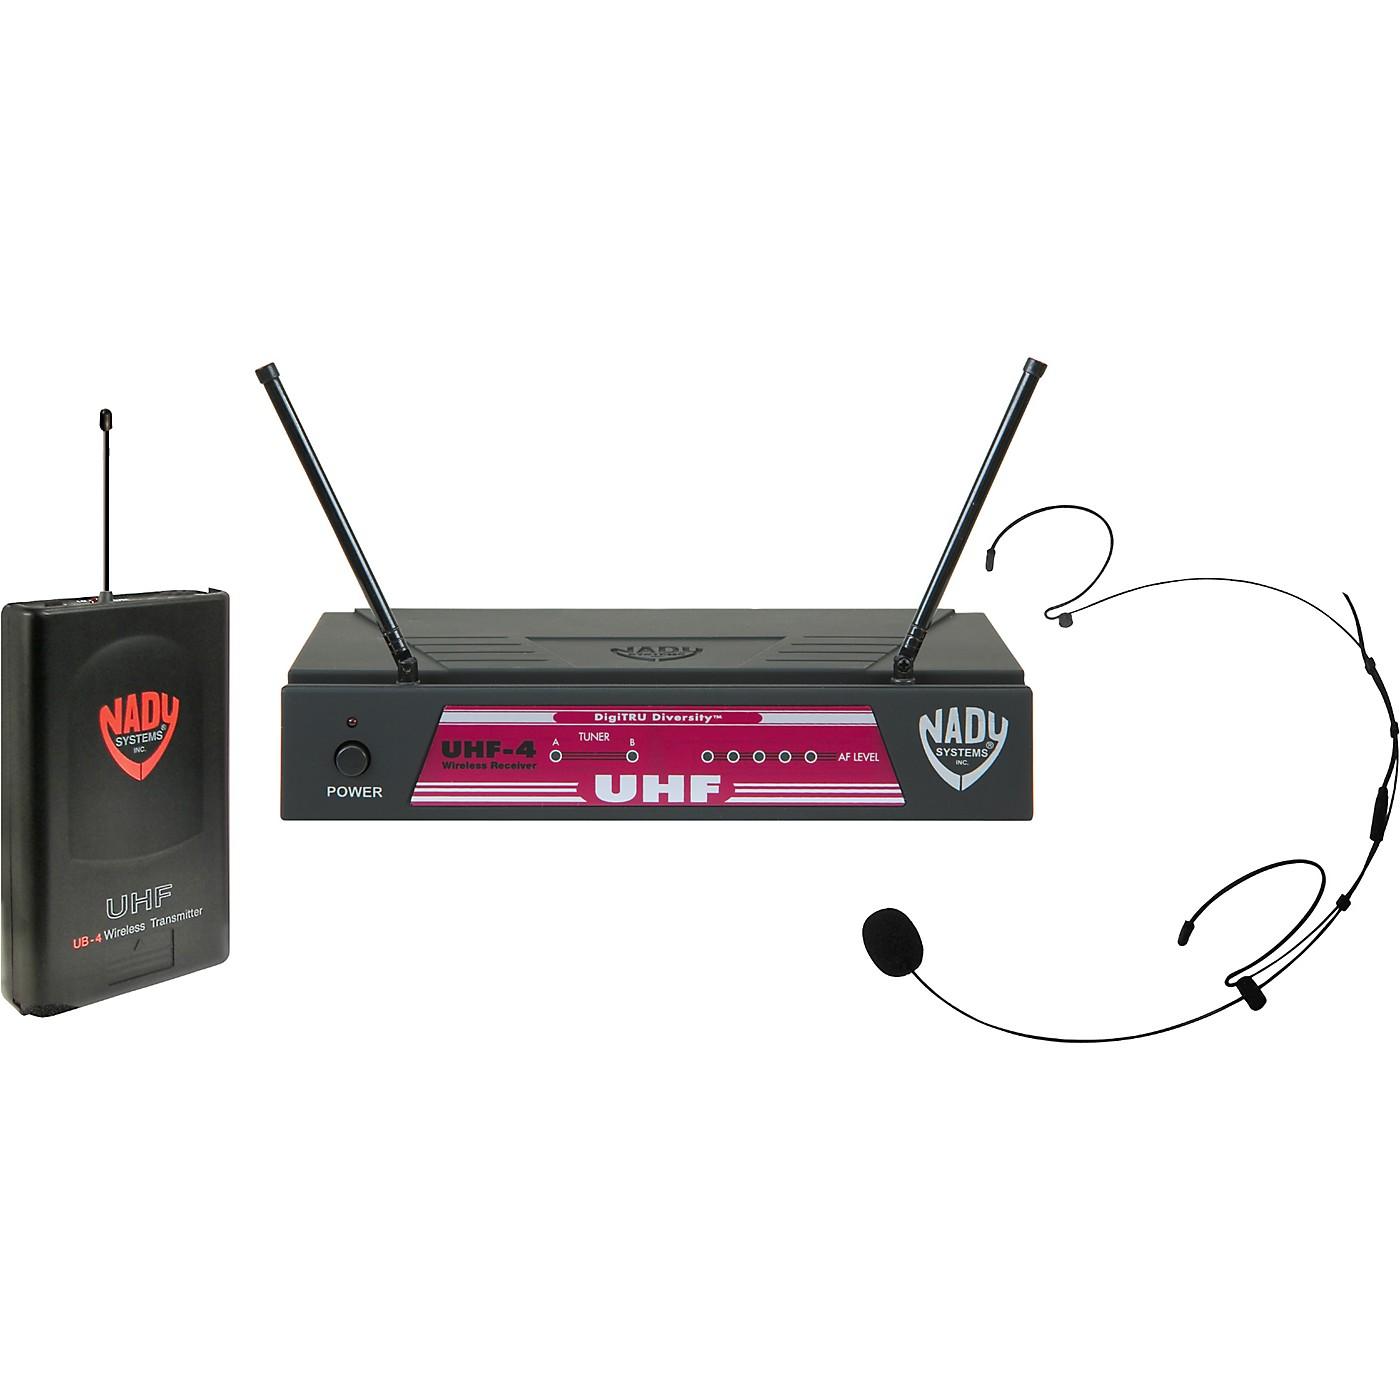 Nady UHF-4 LT/HM-20U (115) Headset Wireless System thumbnail